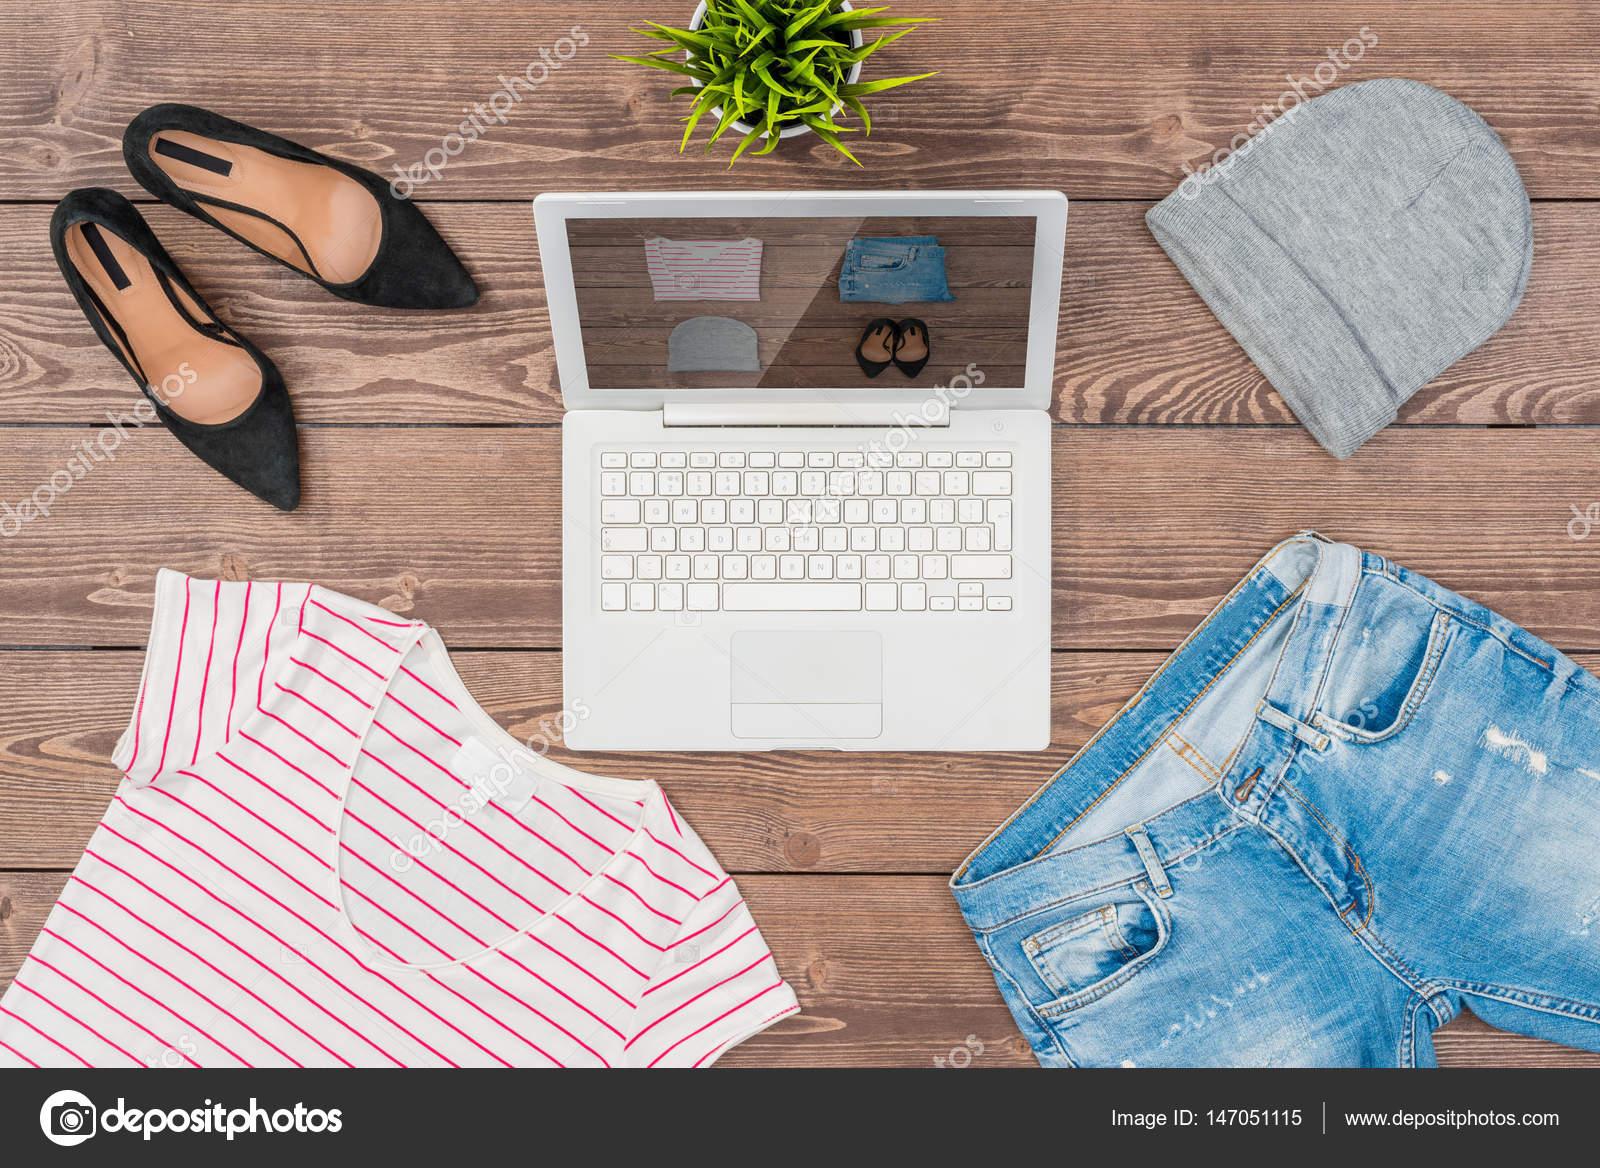 17a27f4af497 Online αγορές έννοια με casual Γυναικεία ρούχα — Φωτογραφία Αρχείου ...